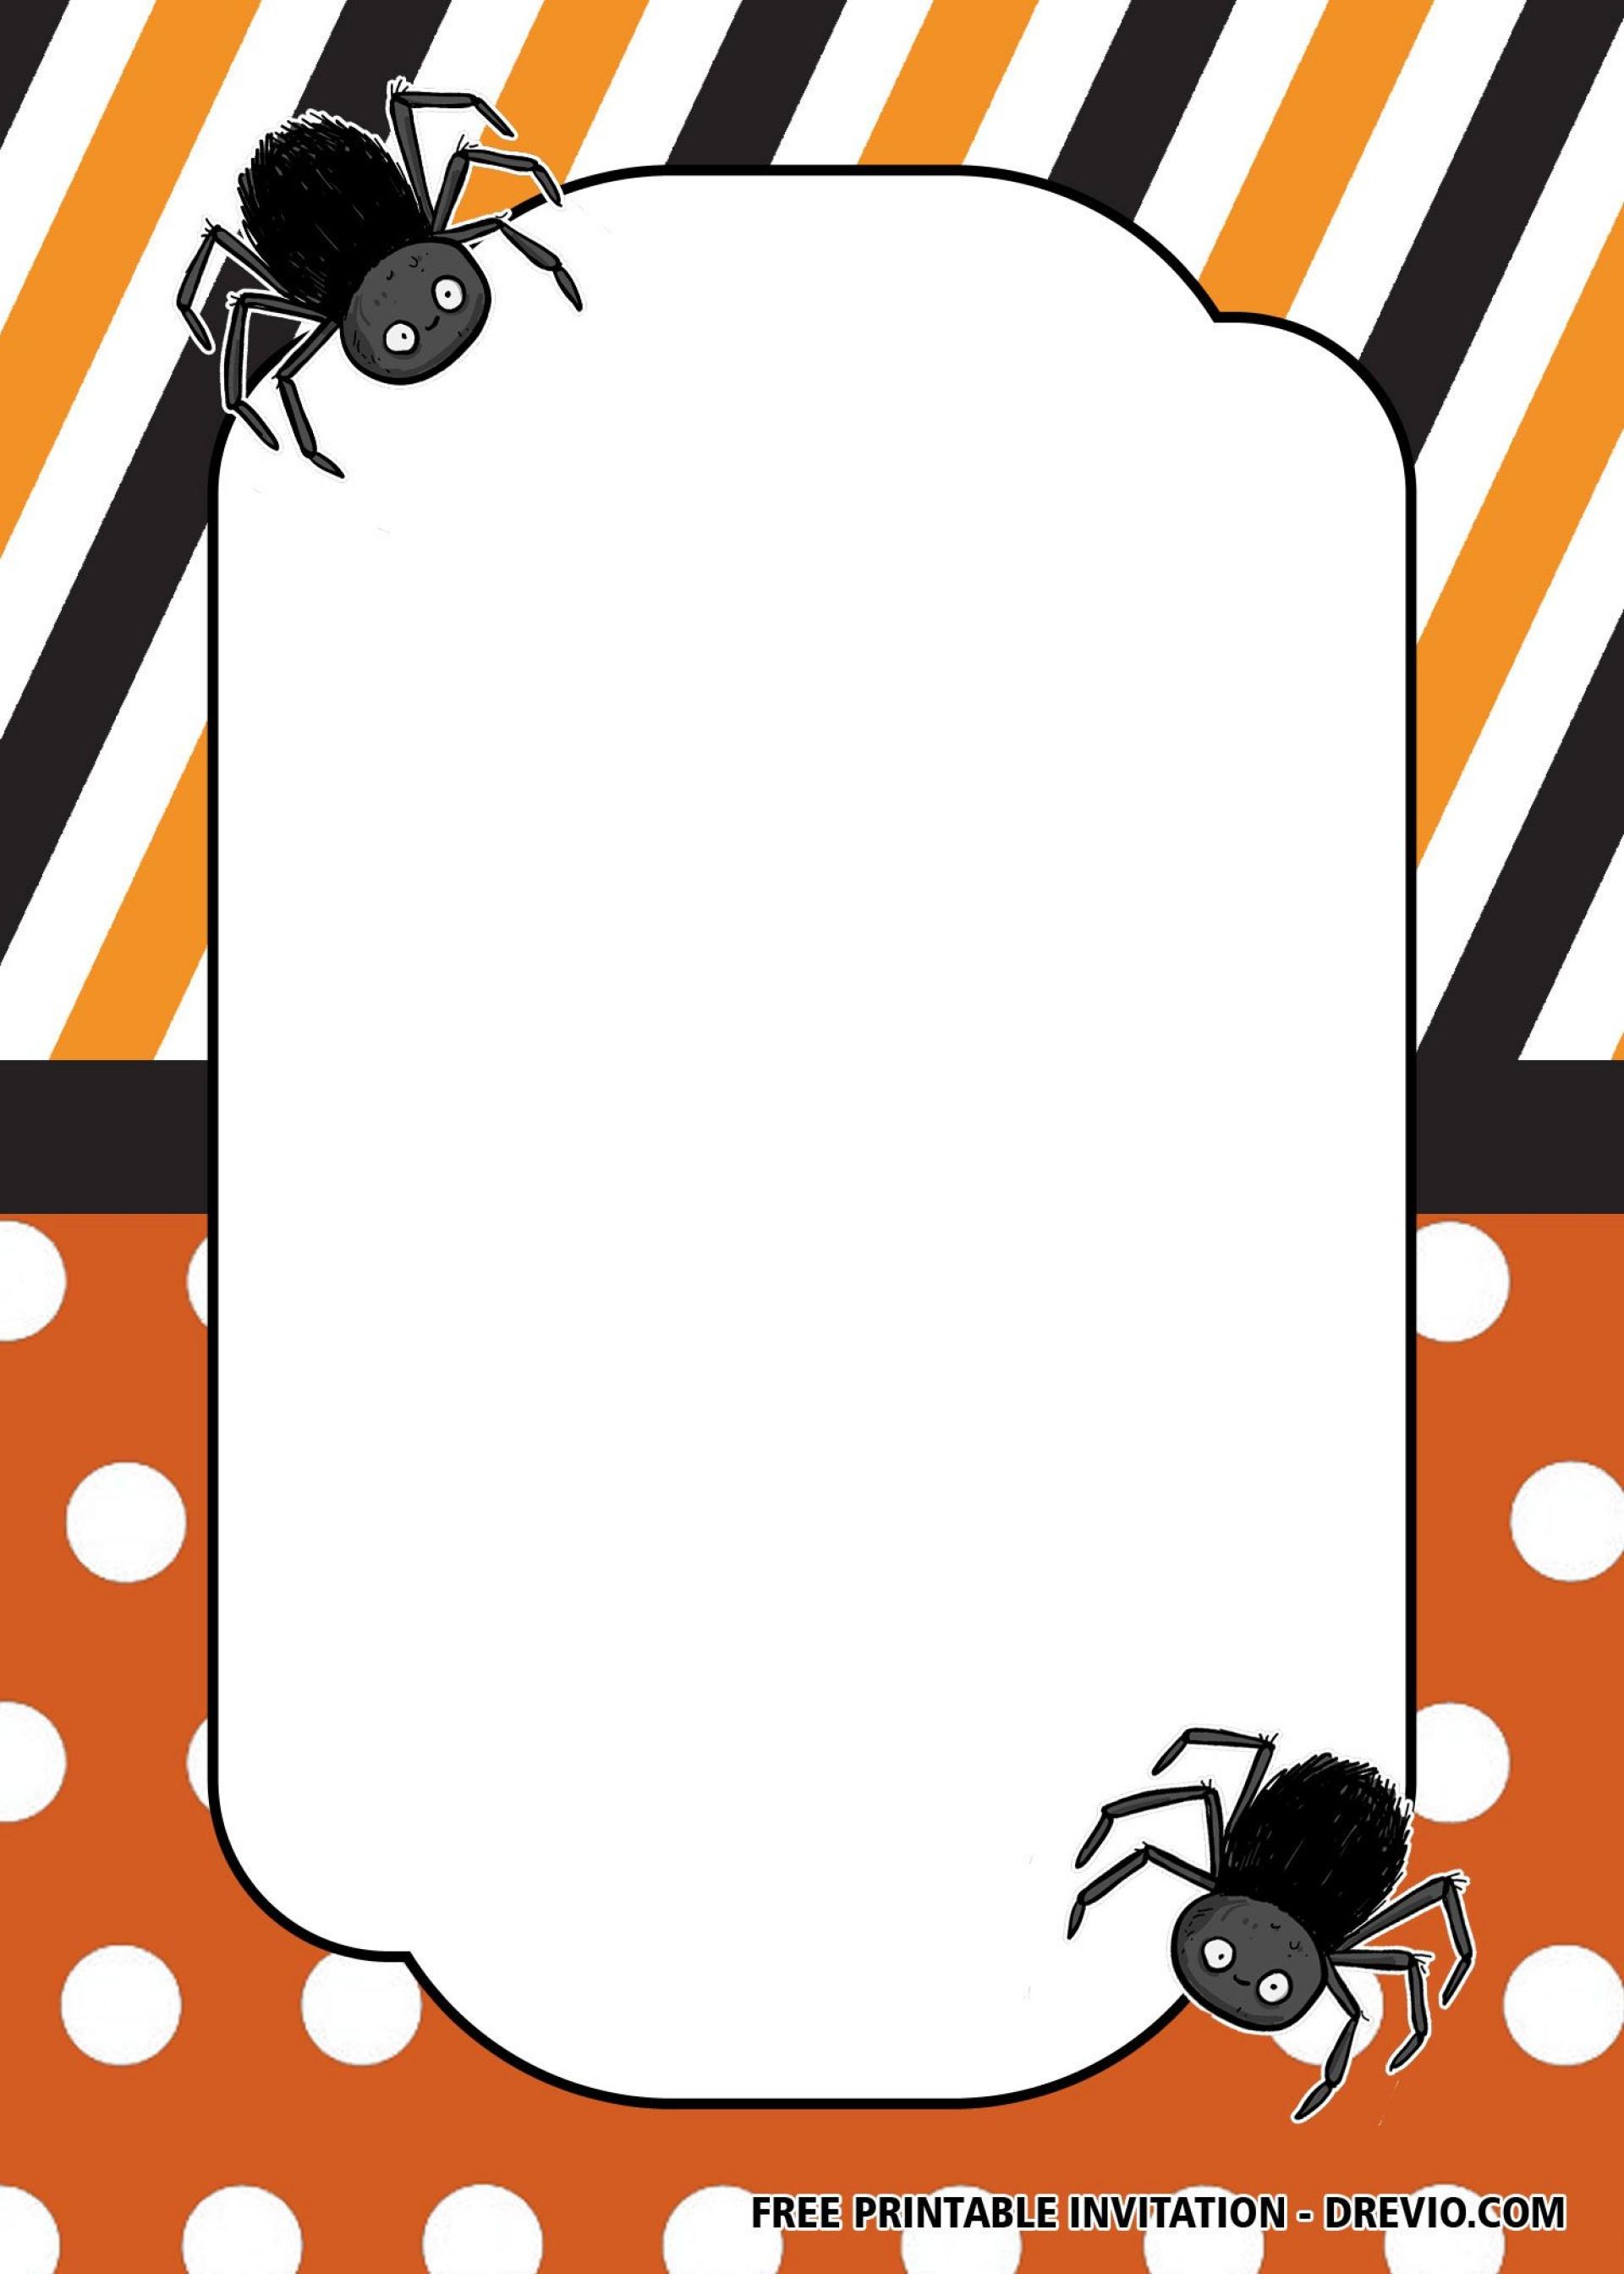 011 Stunning Halloween Party Invitation Template Image  Microsoft Block October1920